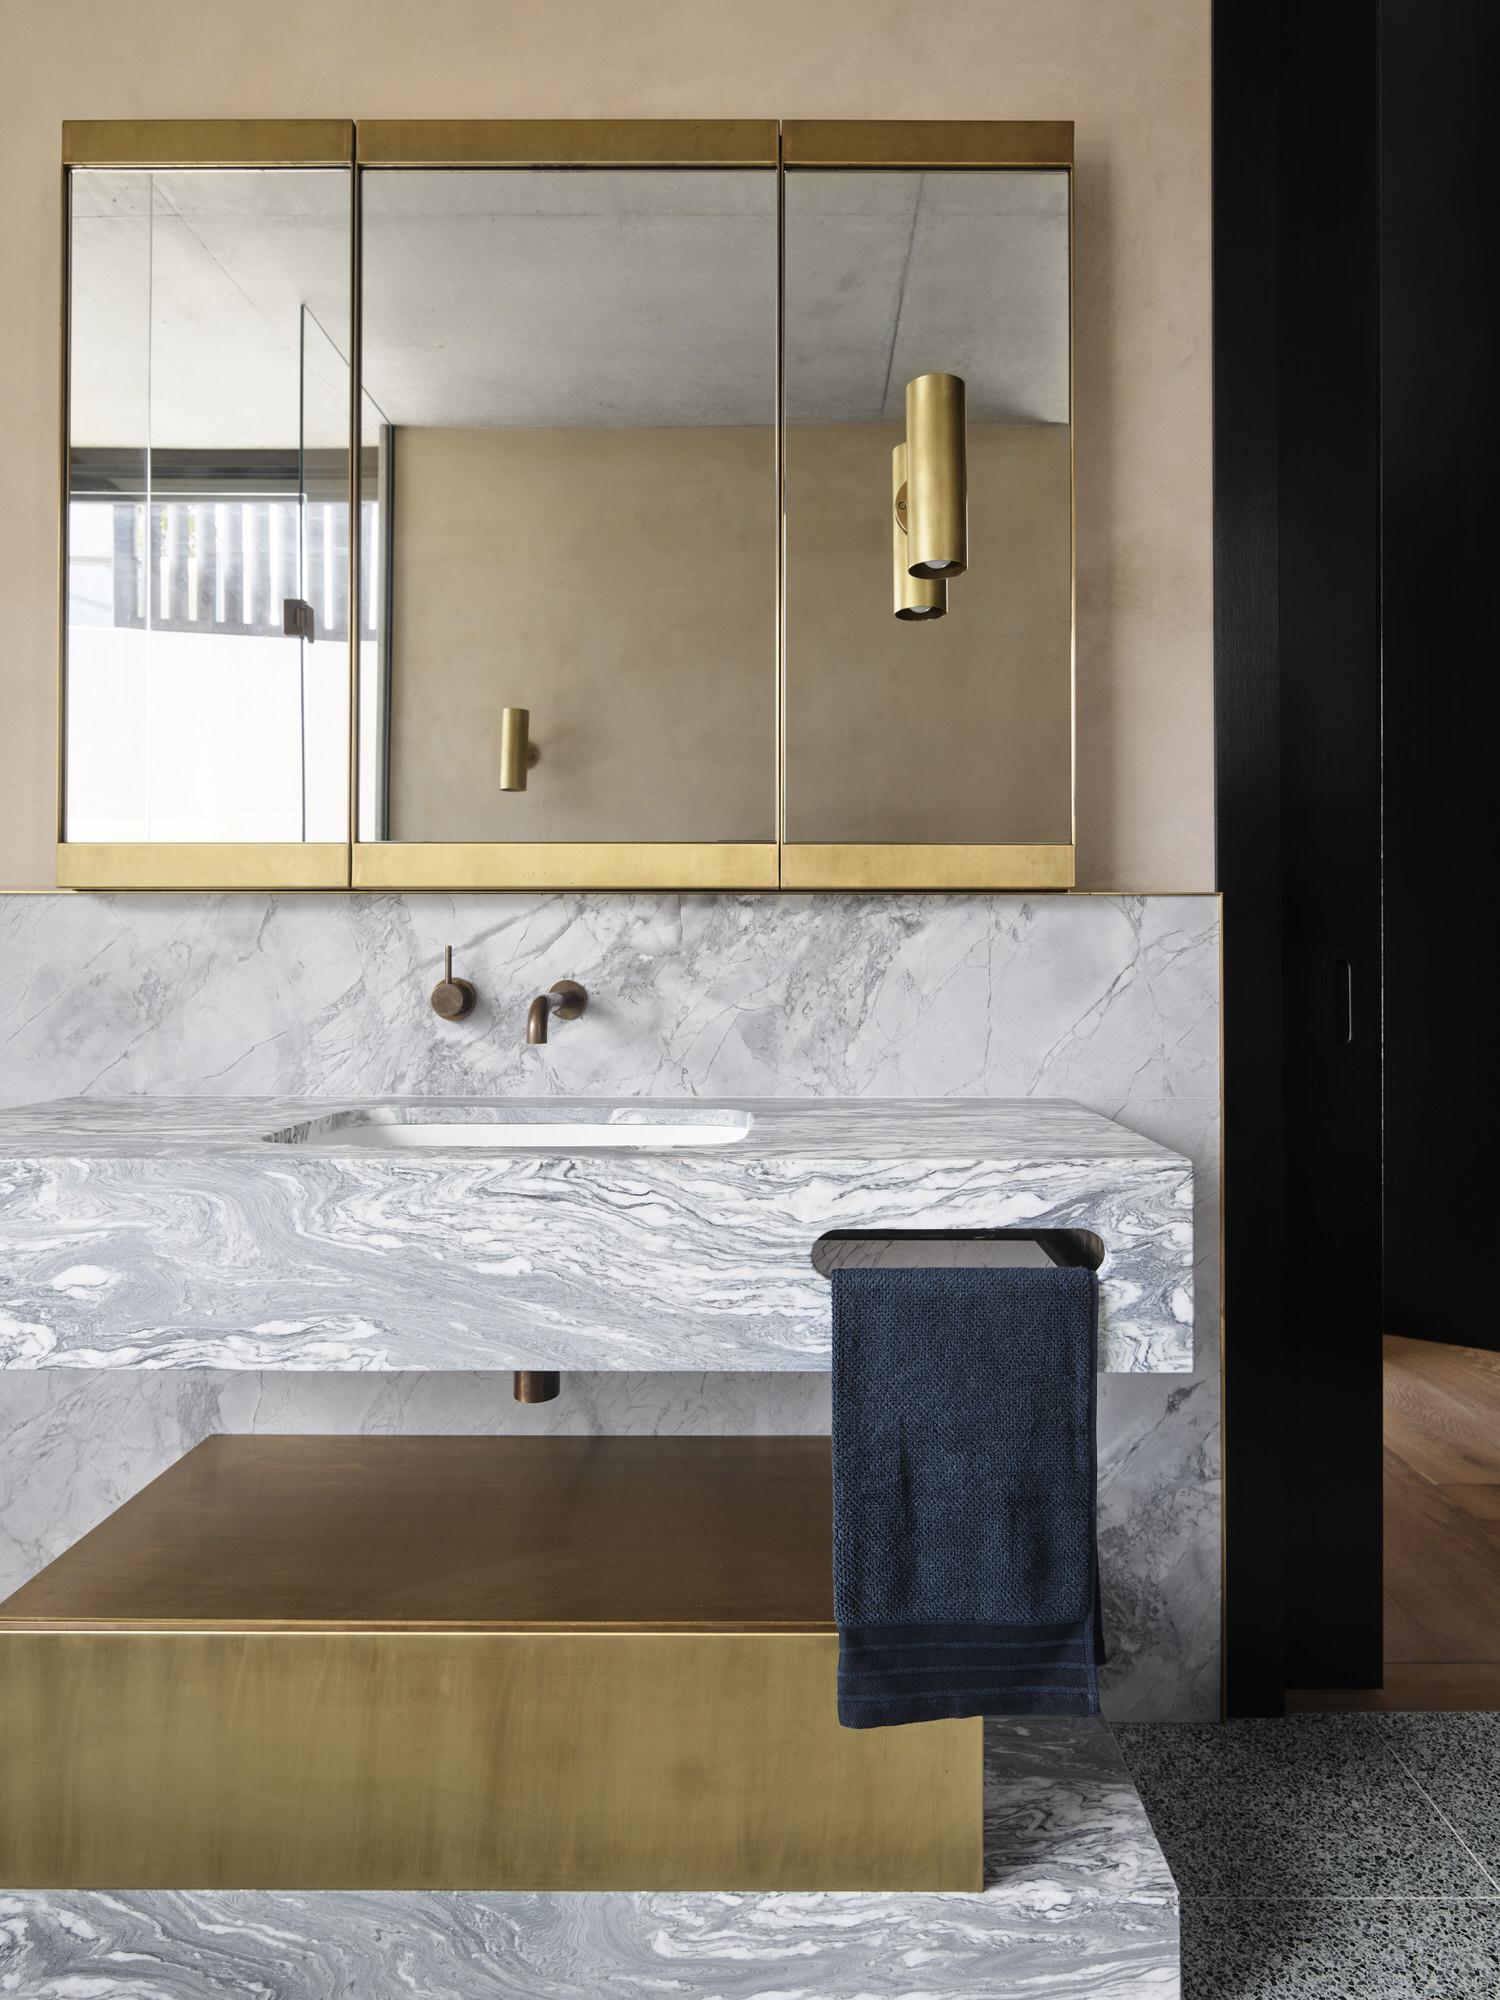 Potts Point St Neot Residence, Flack Studio, Luxury Residential Interiors, Photo Anson Smart | Yellowtrace